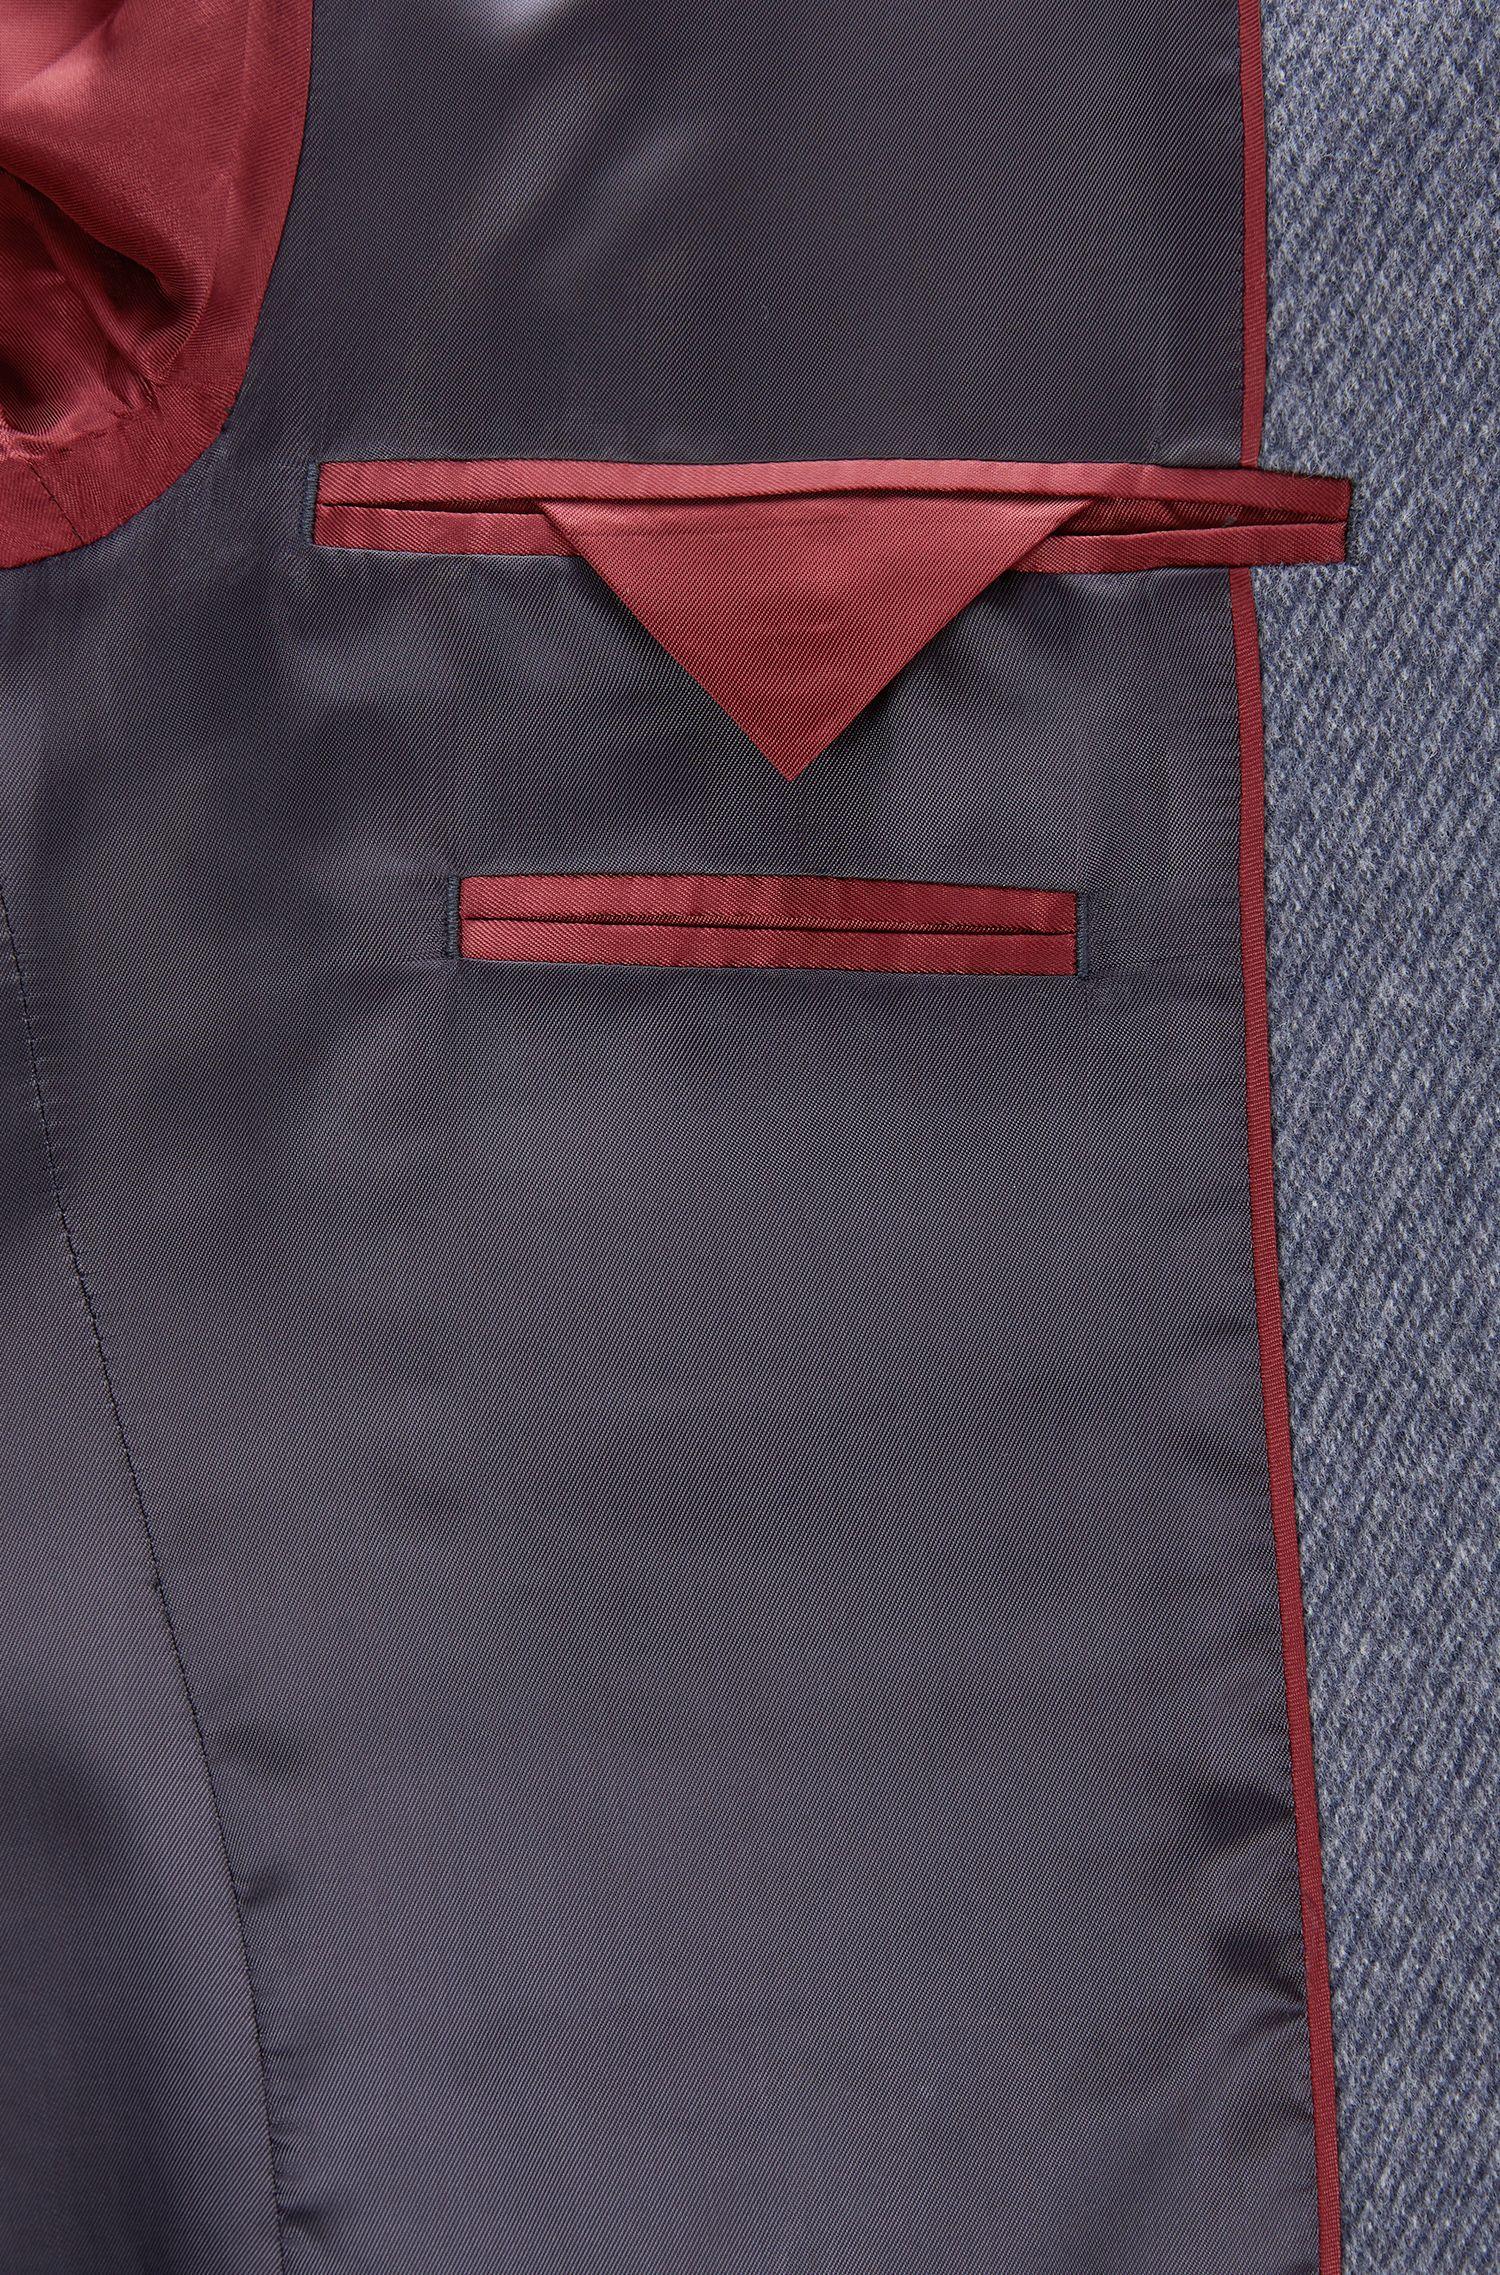 Virgin Wool-Cashmere Coat | Stratus